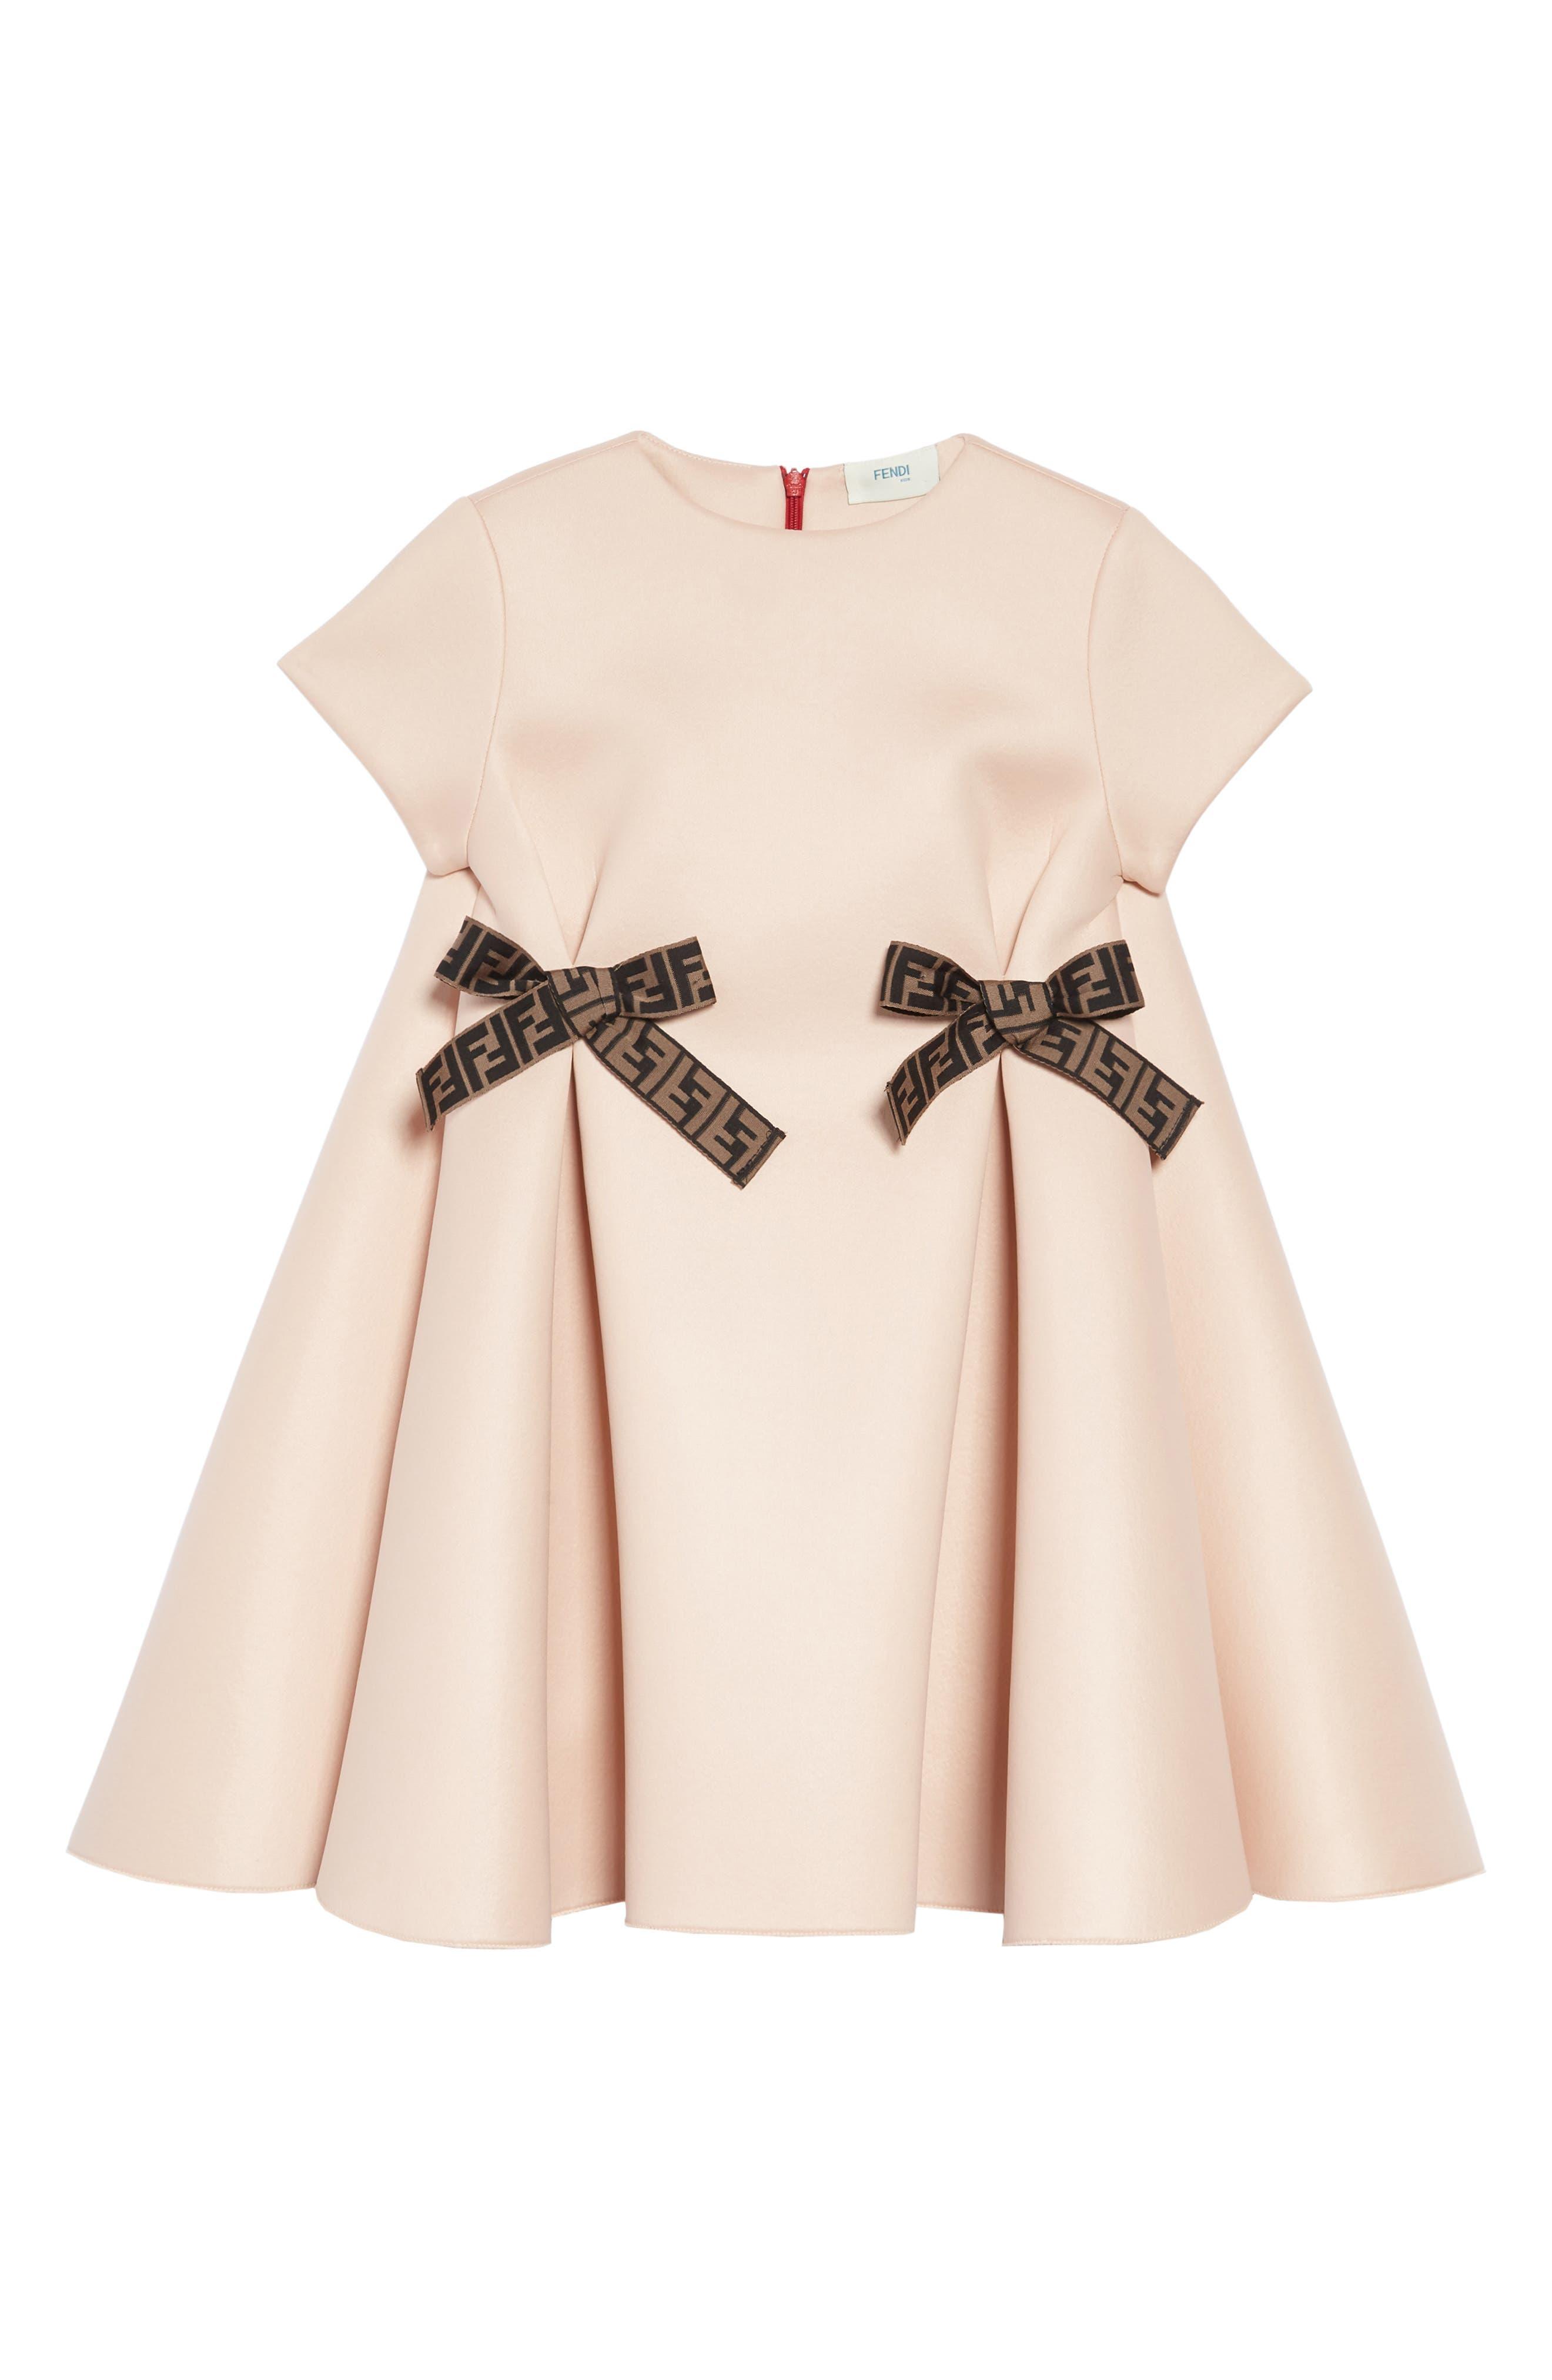 FENDI Bow Detail Dress, Main, color, F0JE6 PEACH